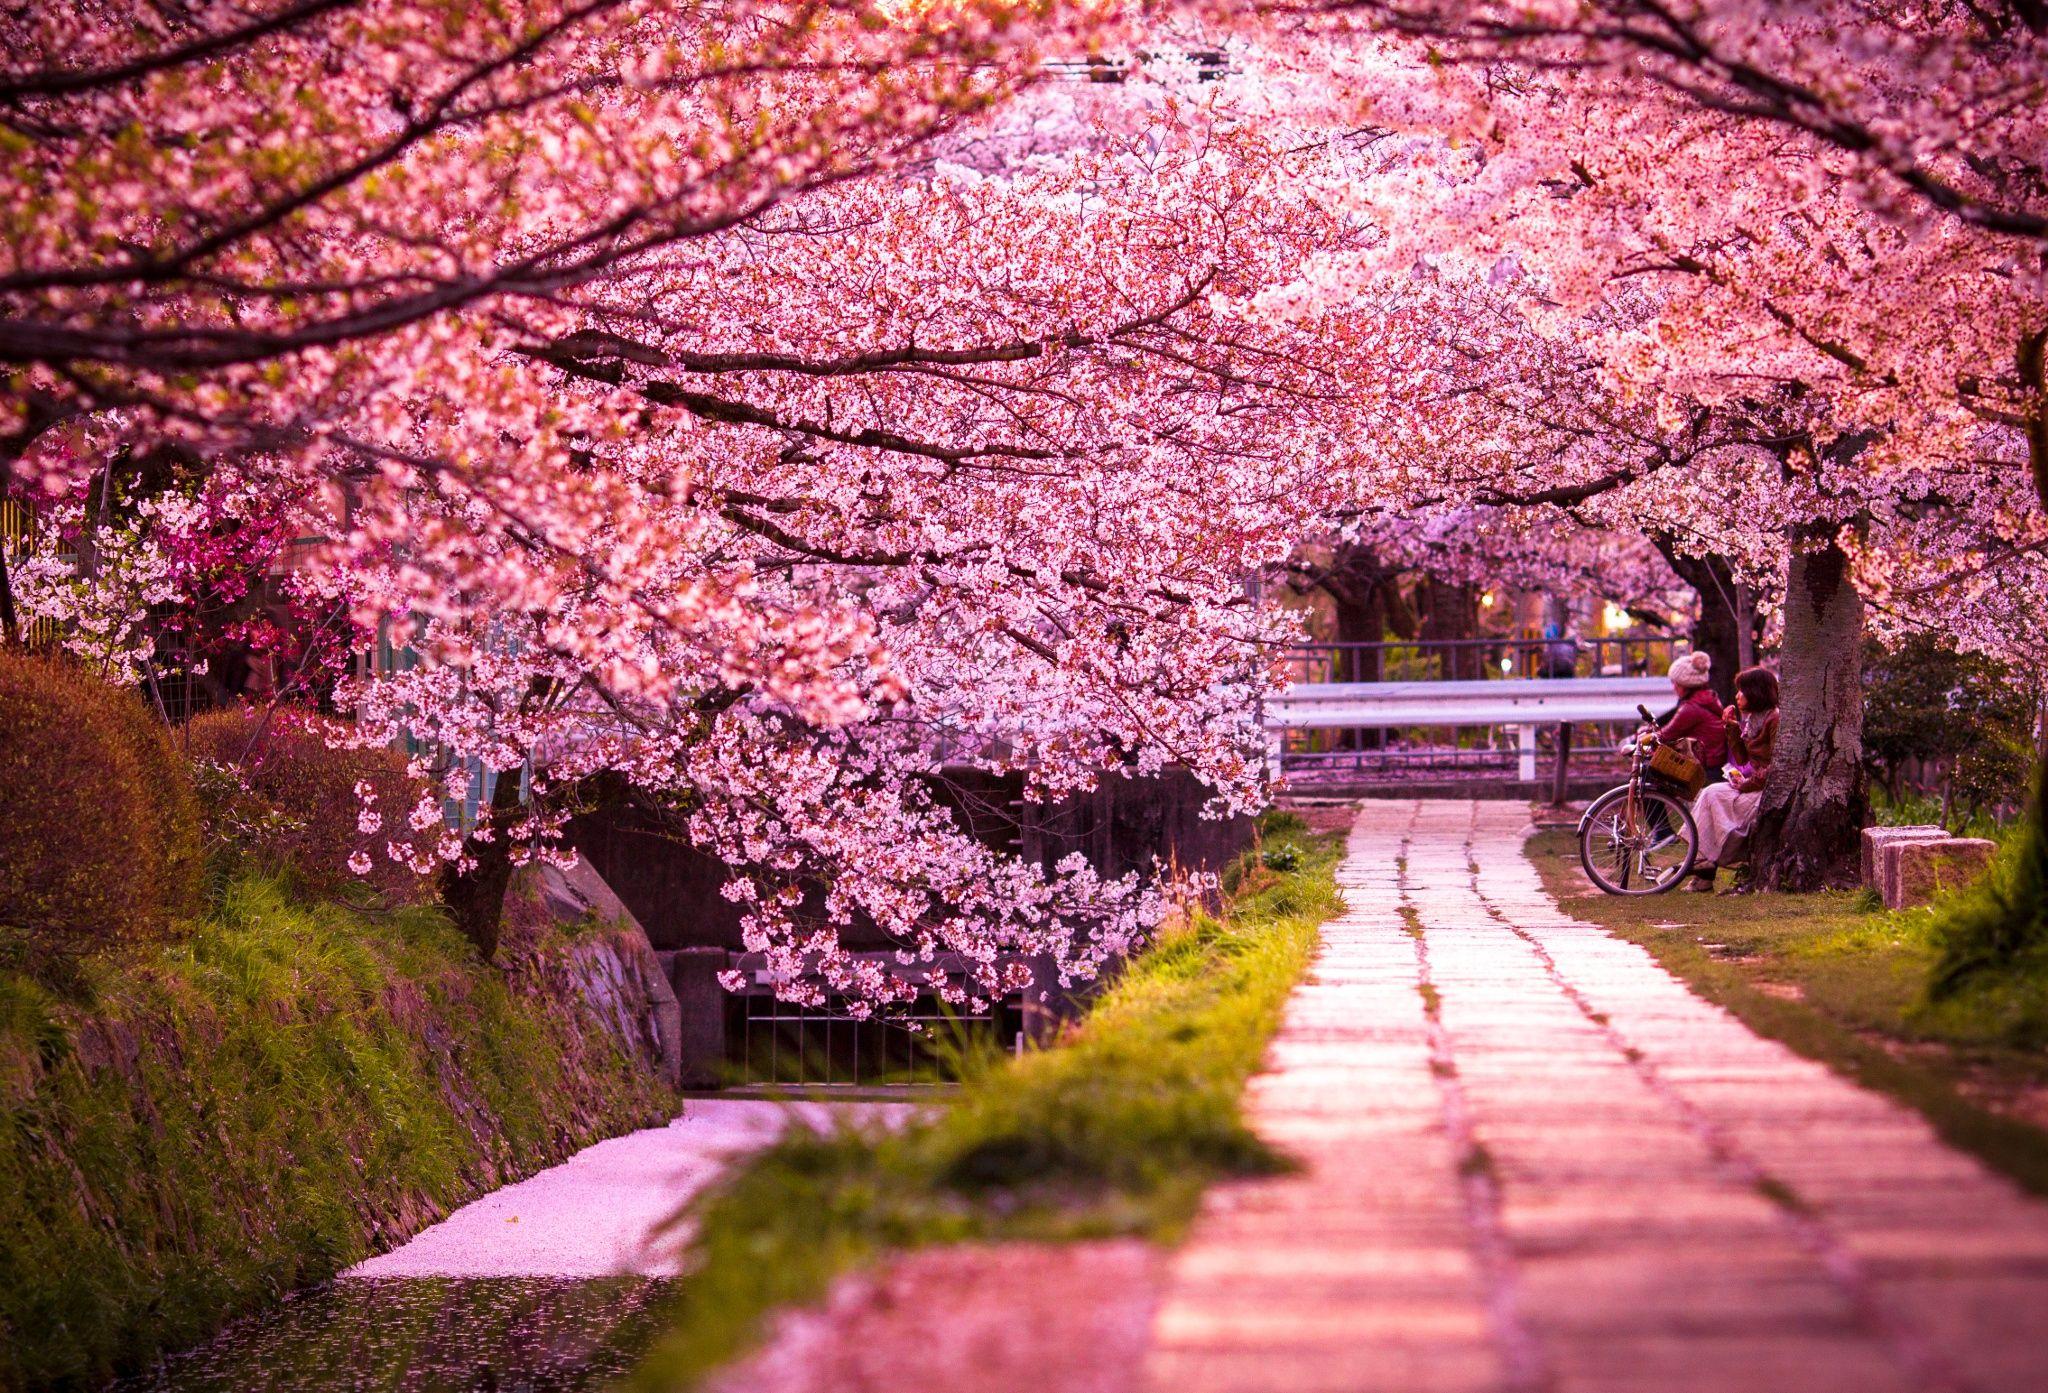 Real Dark Magic Spells That Work Call Whatsapp 27843769238 Beautiful Streets Cherry Blossom Festival Nature